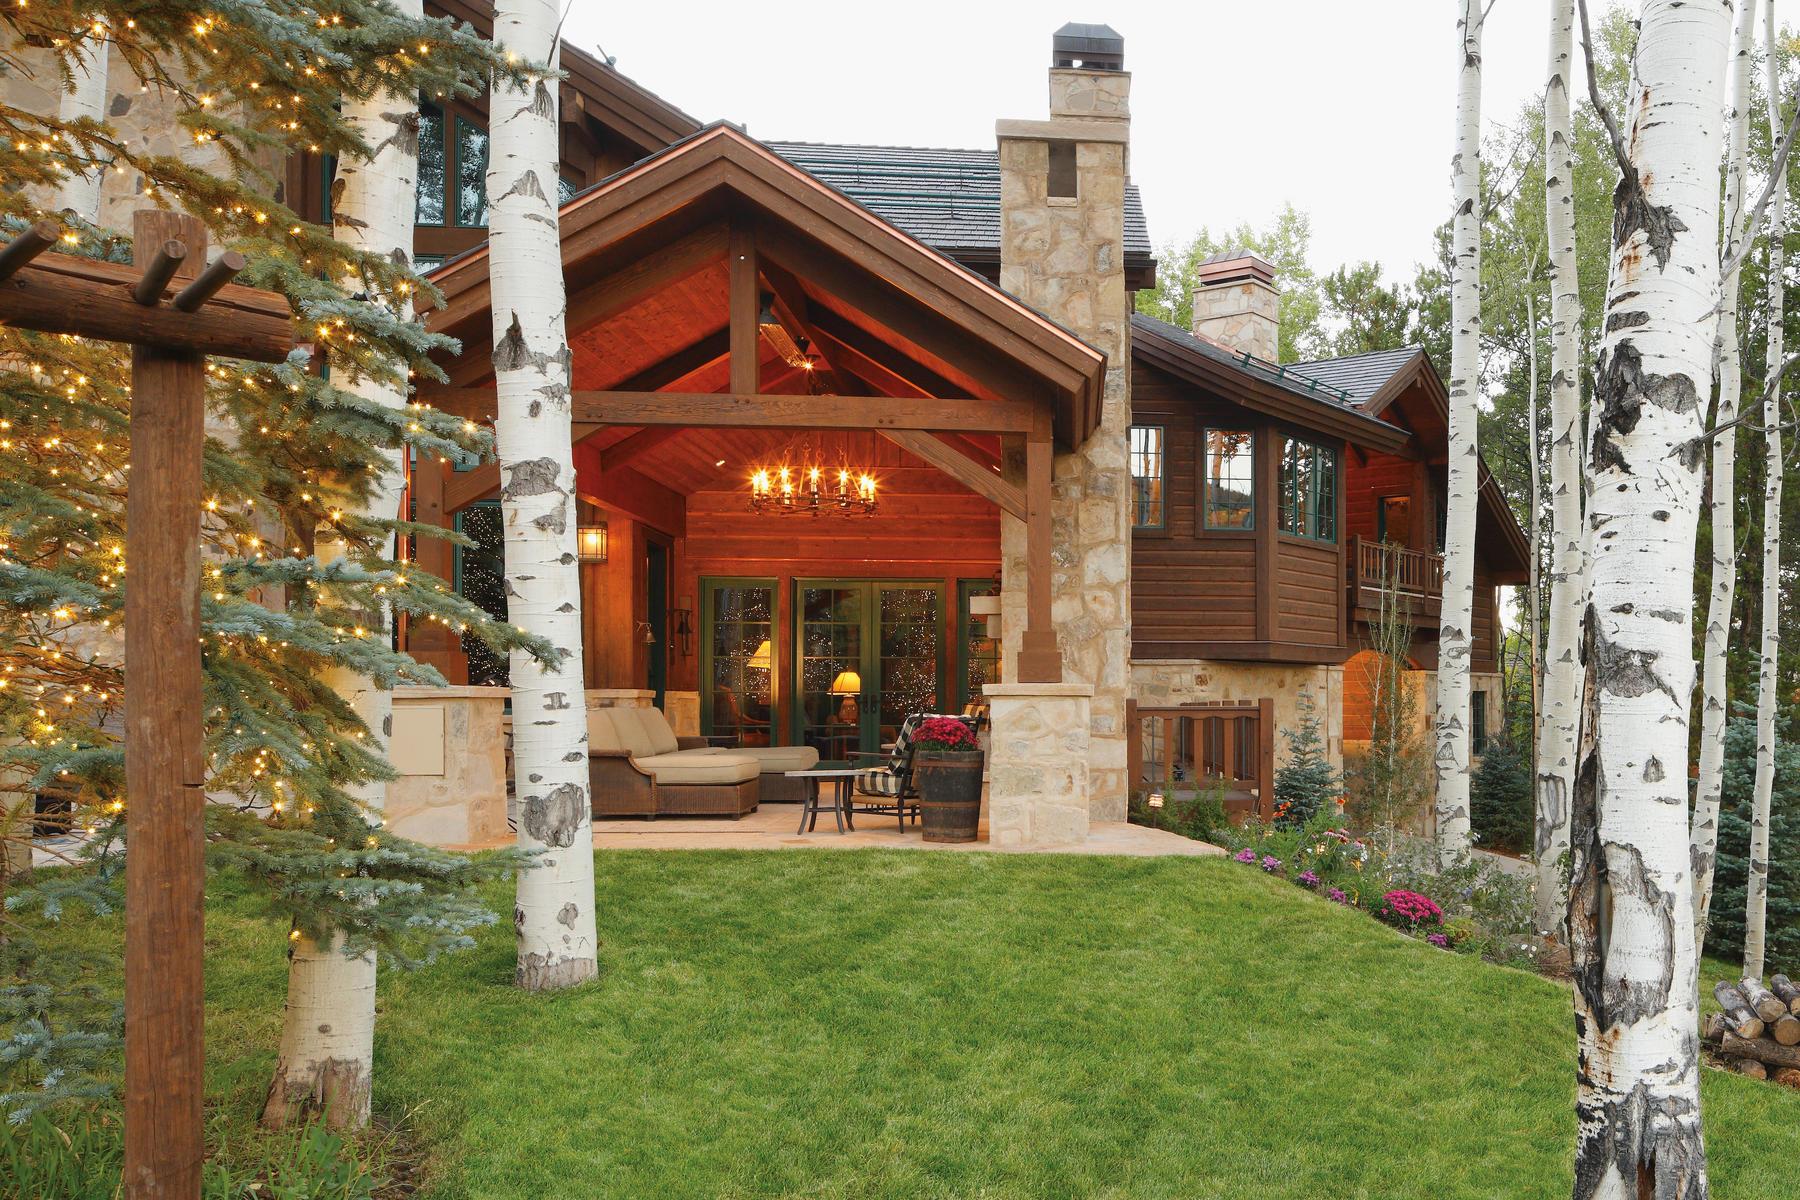 Additional photo for property listing at Strawberry Park Ski Lodge 373 Strawberry Park Beaver Creek, Colorado 81620 United States